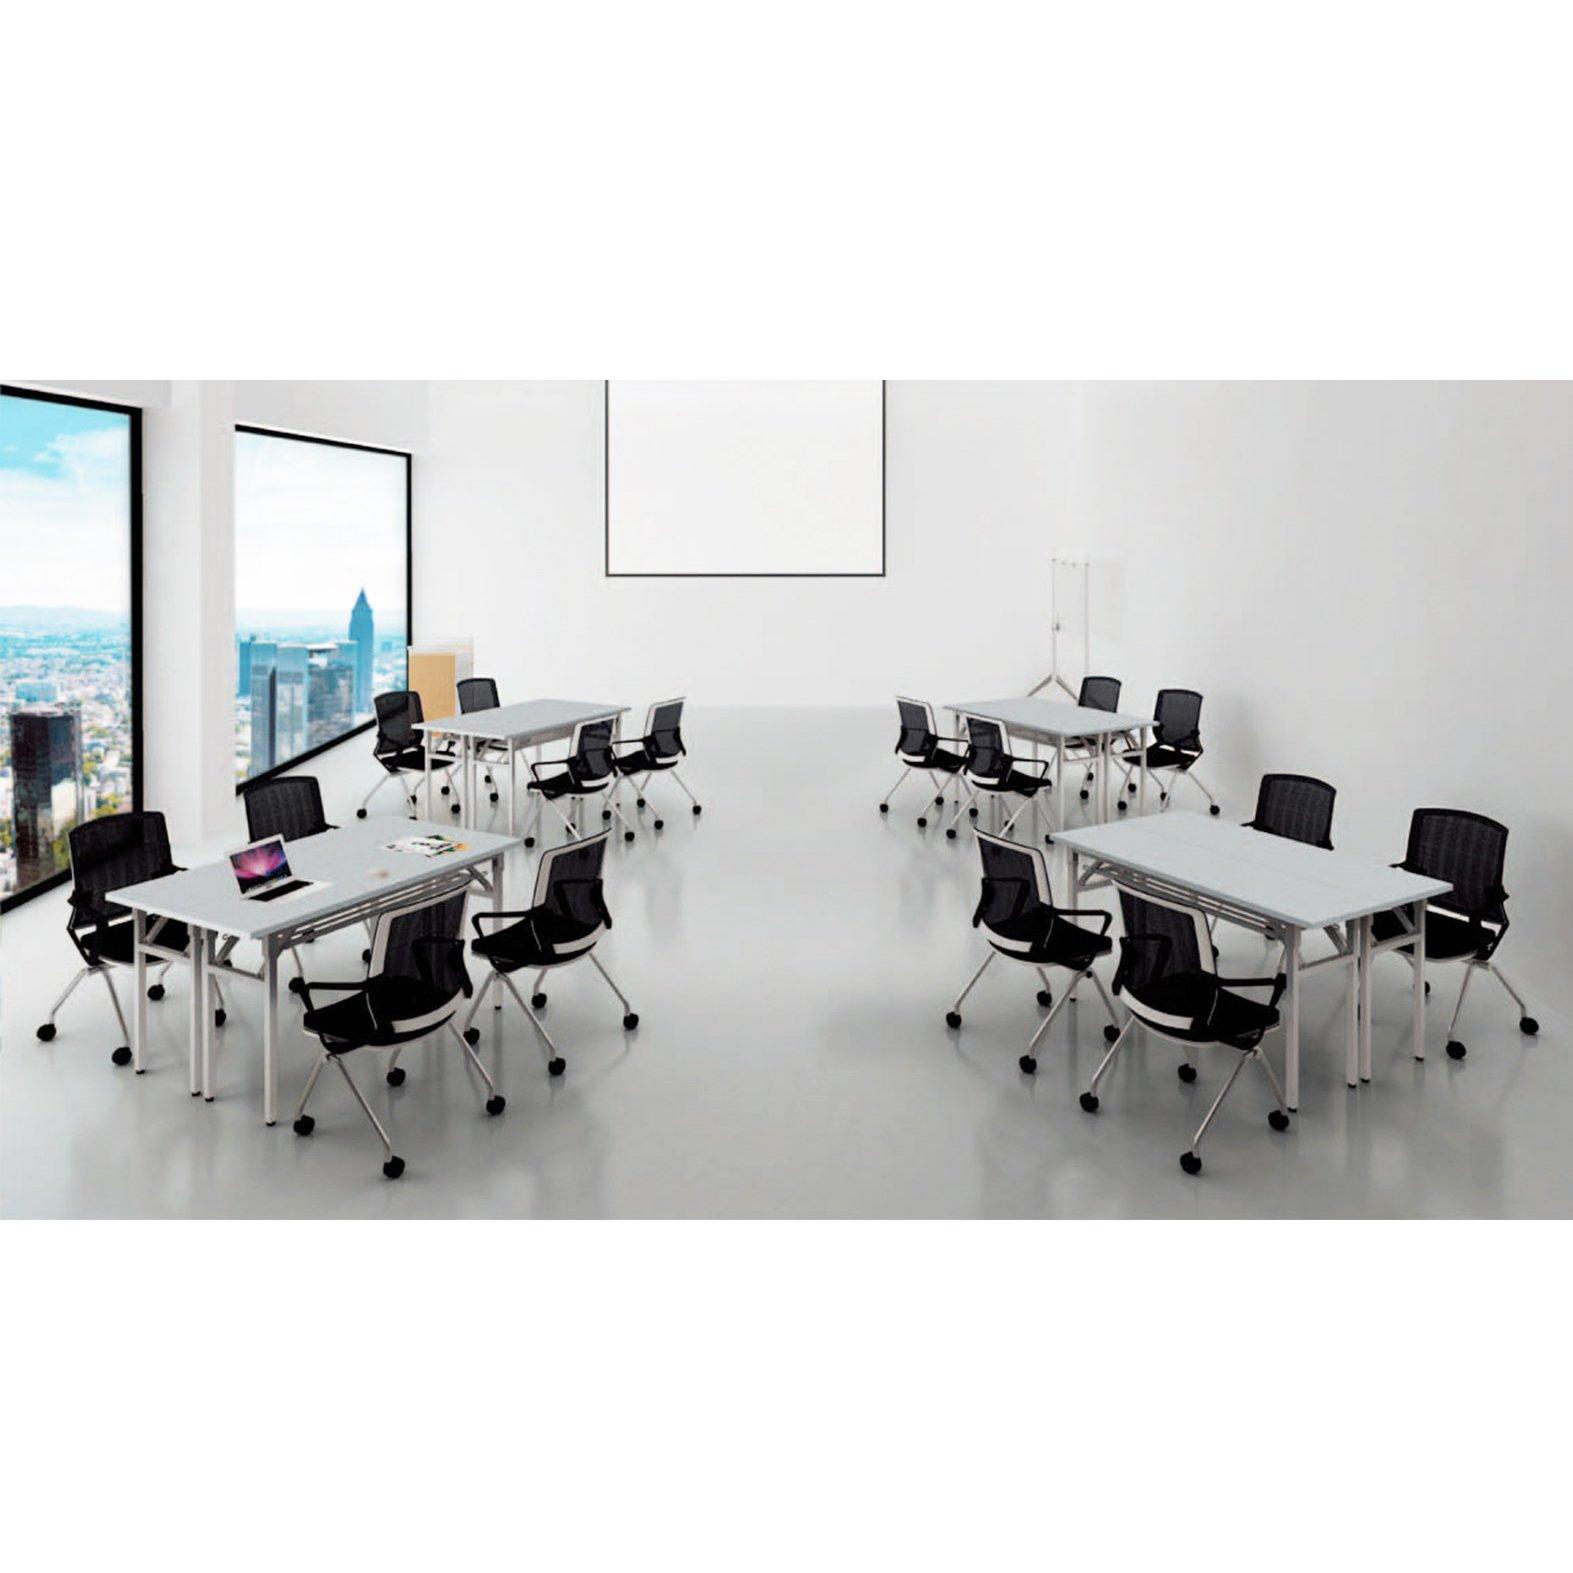 Sunon Folding Training Table 55'' Rectangle Wood Folding Table for Training/Meeting Room (White, 55-Inch Length) by Sunon (Image #6)